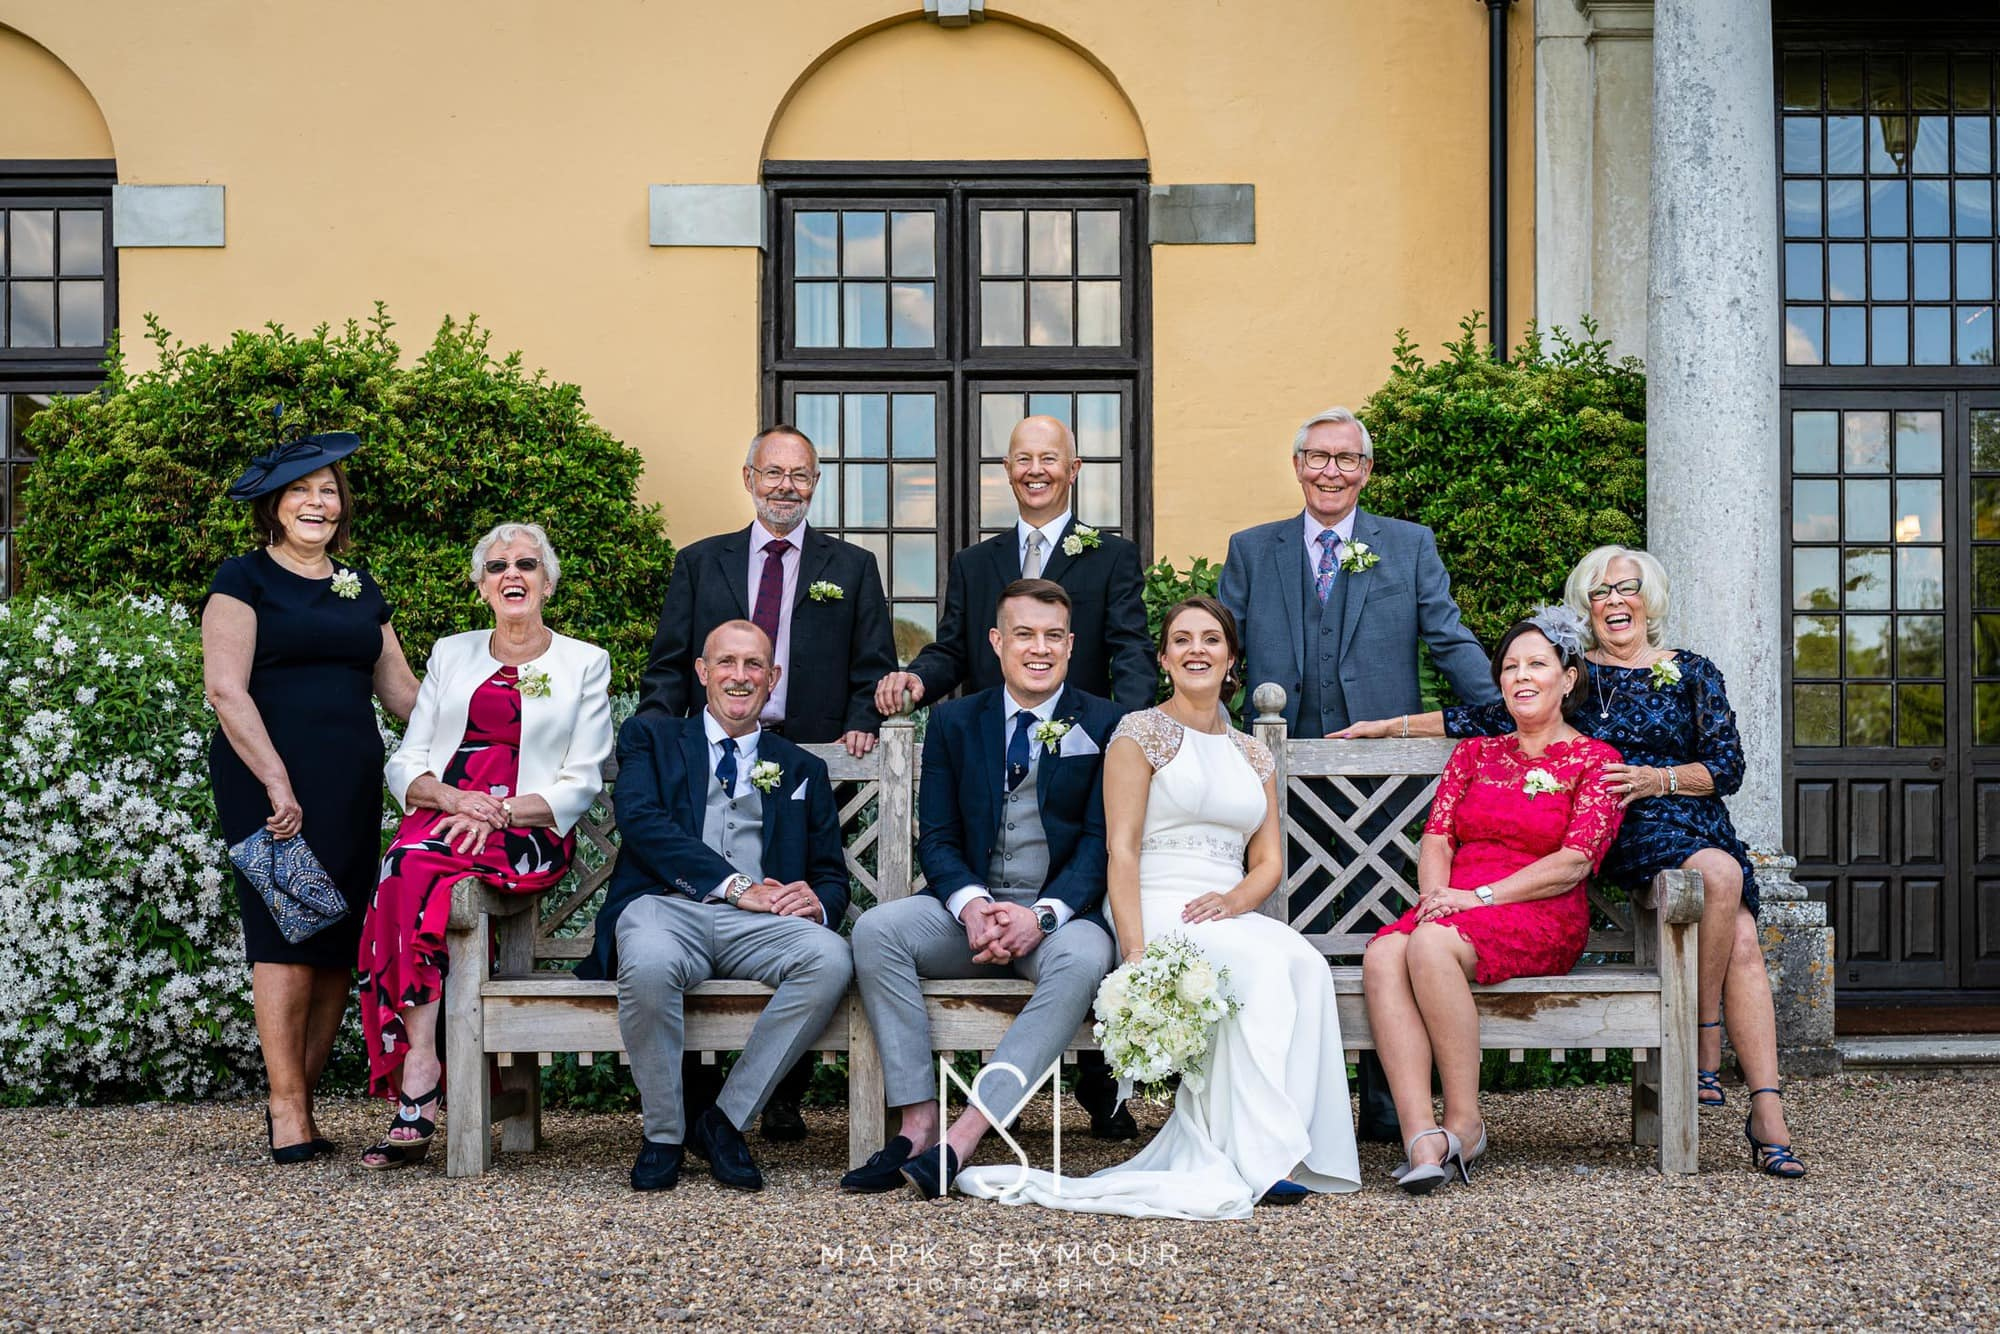 Hampden House Wedding Photography - Hannah and Lee's wedding. 17